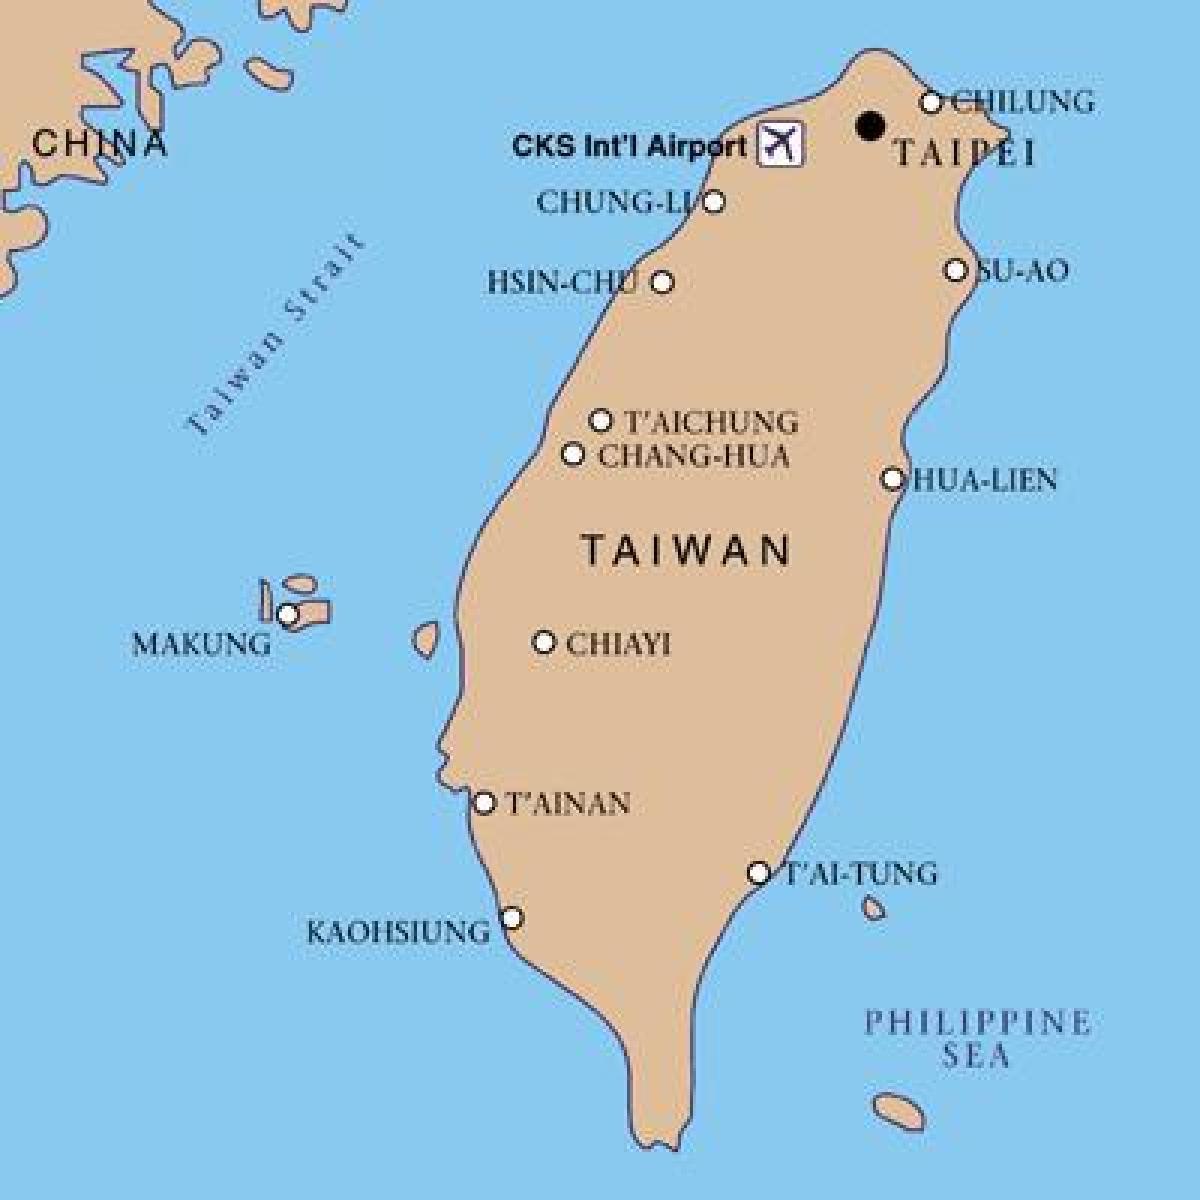 Karte Anzeigen.Taiwan Flughäfen Karte Taiwan Internationaler Flughafen Karte Ost